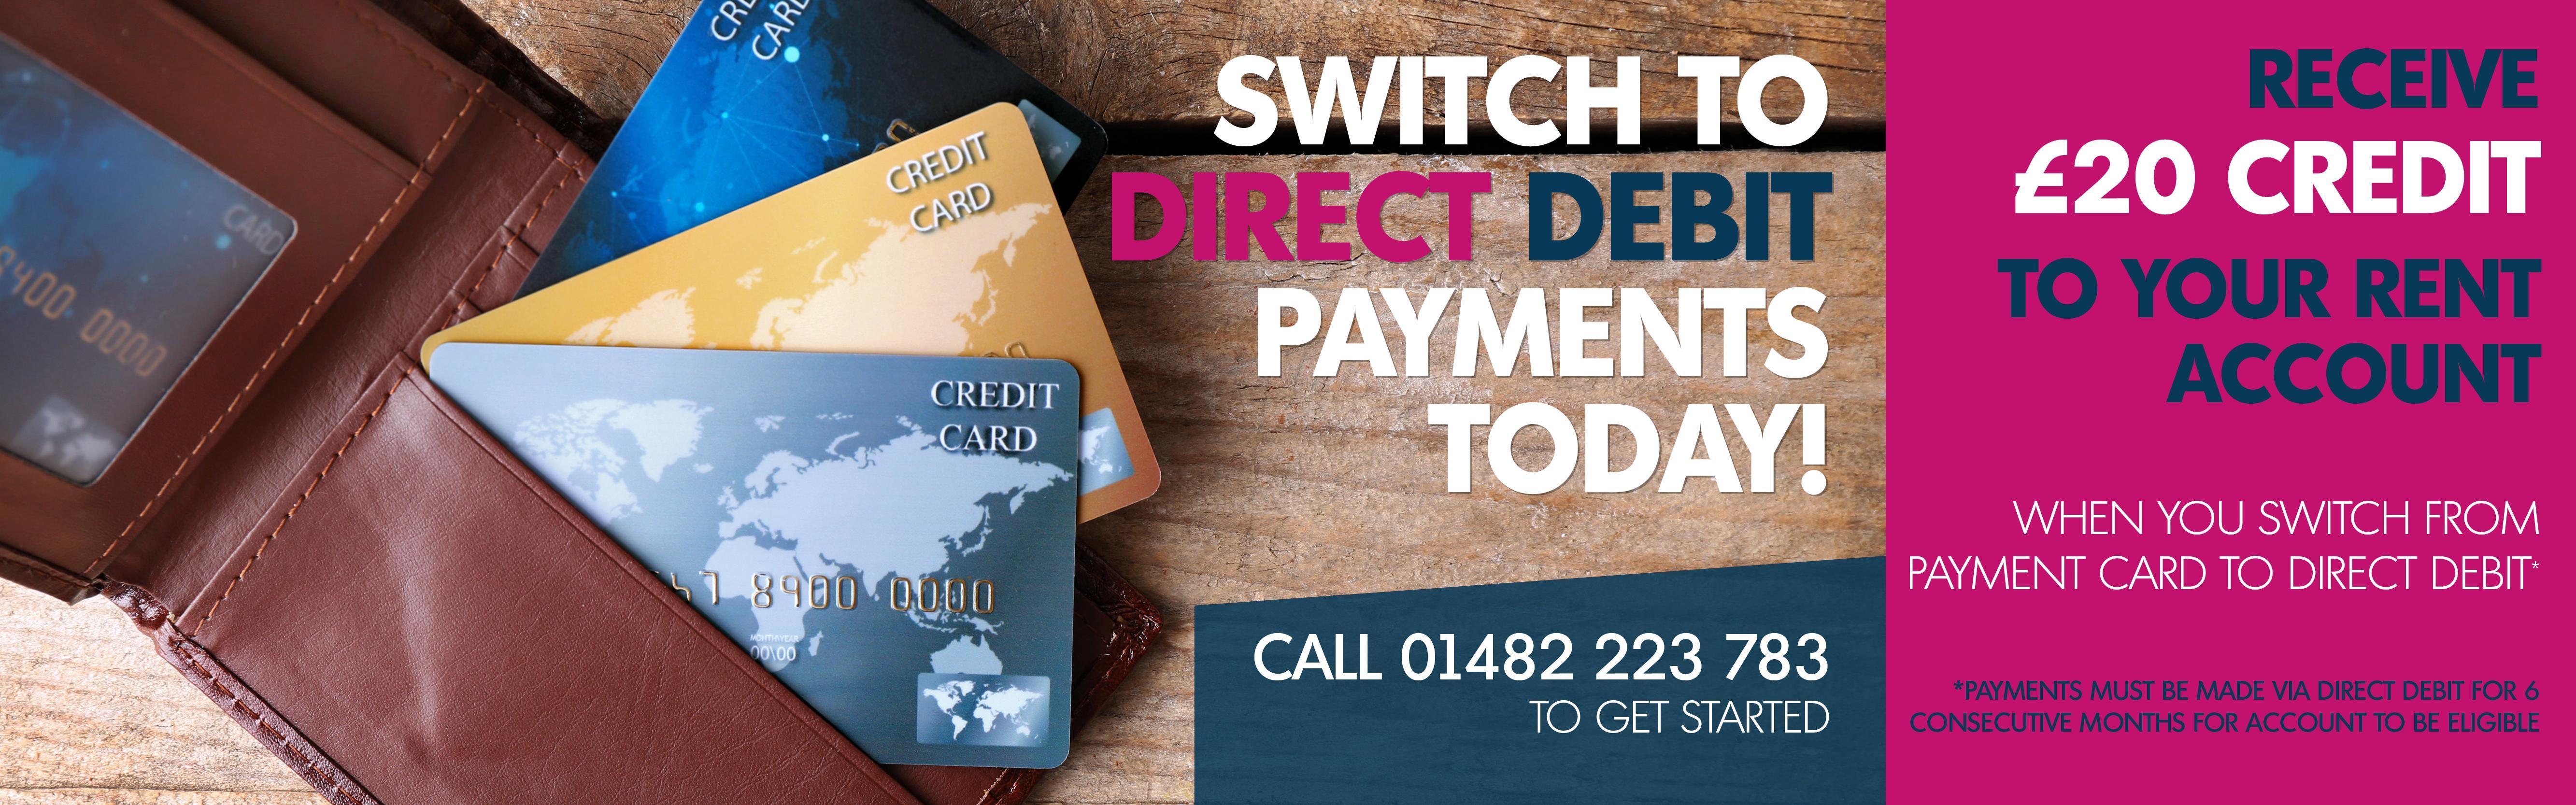 direct debit banner B